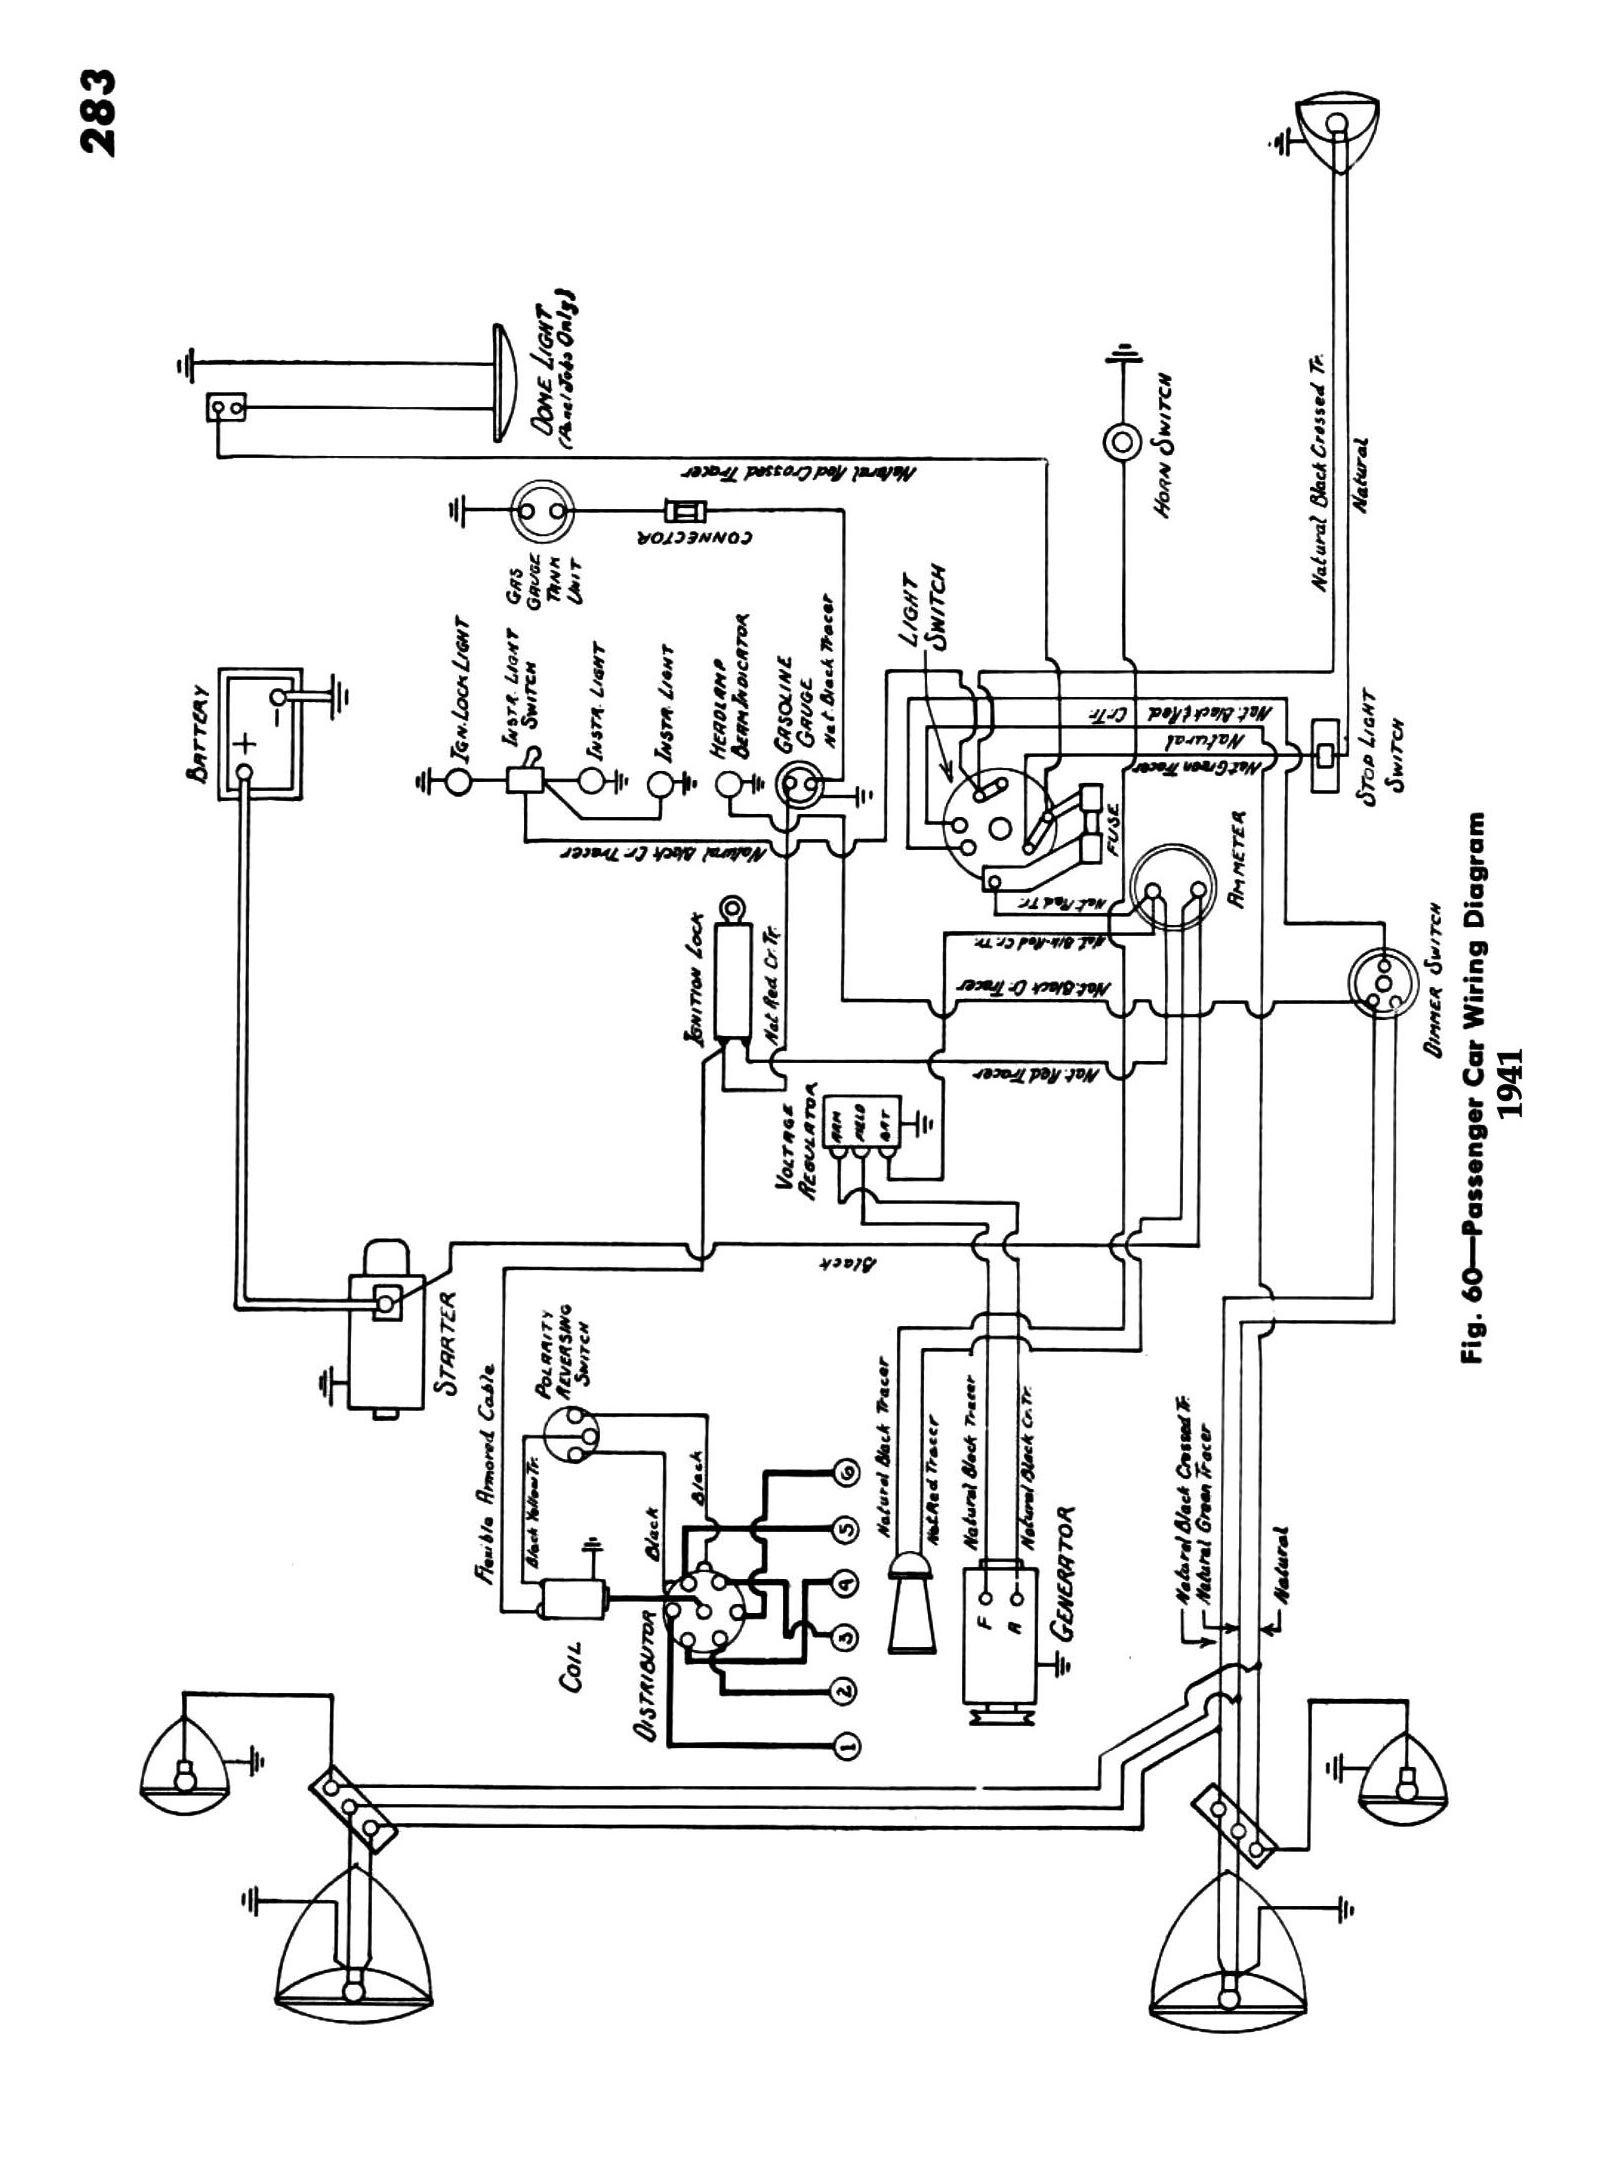 chevrolet truck parts diagram chevy wiring diagrams  u2013 my